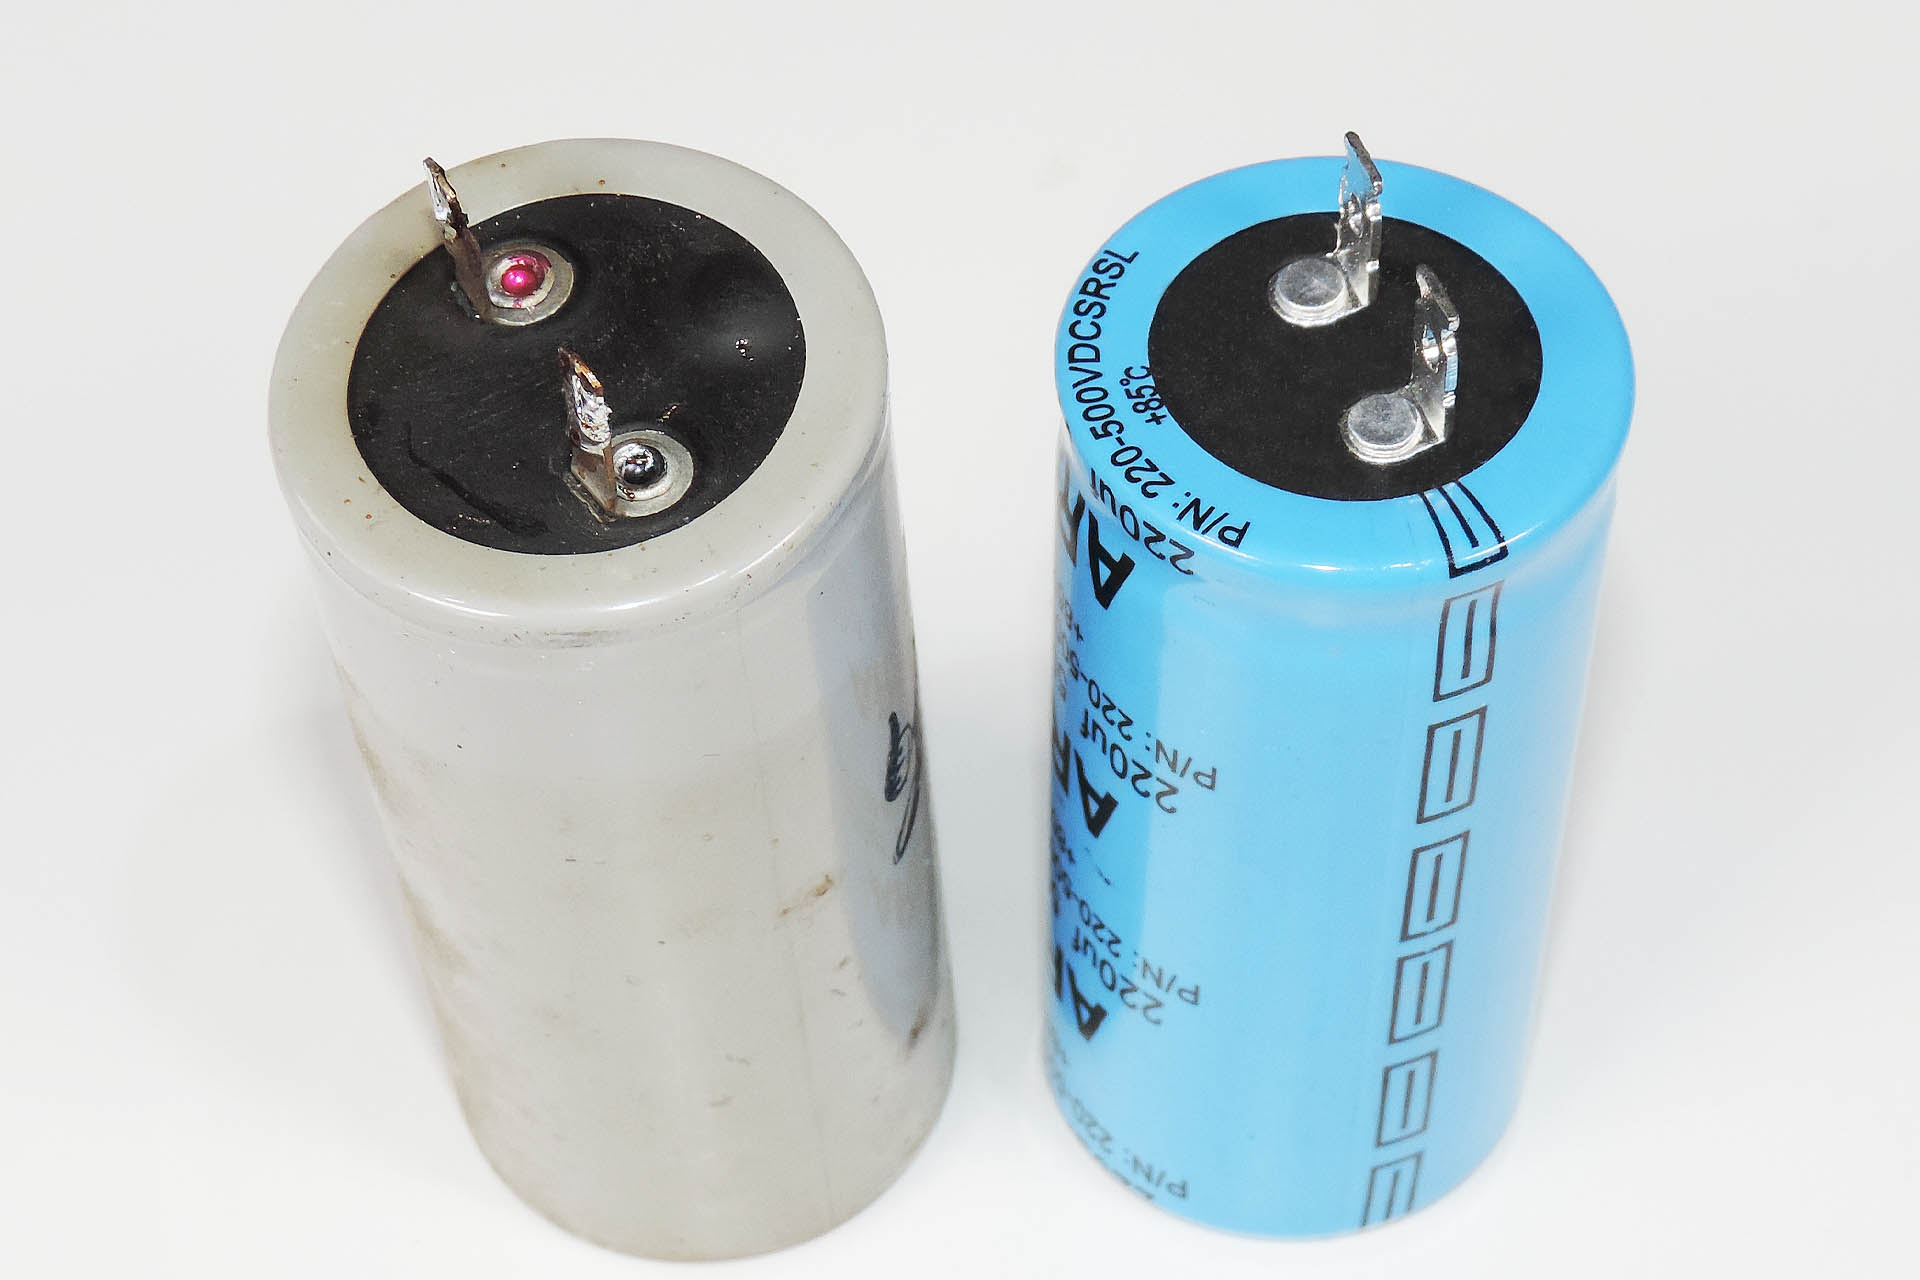 Hiwatt DR-103 - original and new replacement capaciotrs